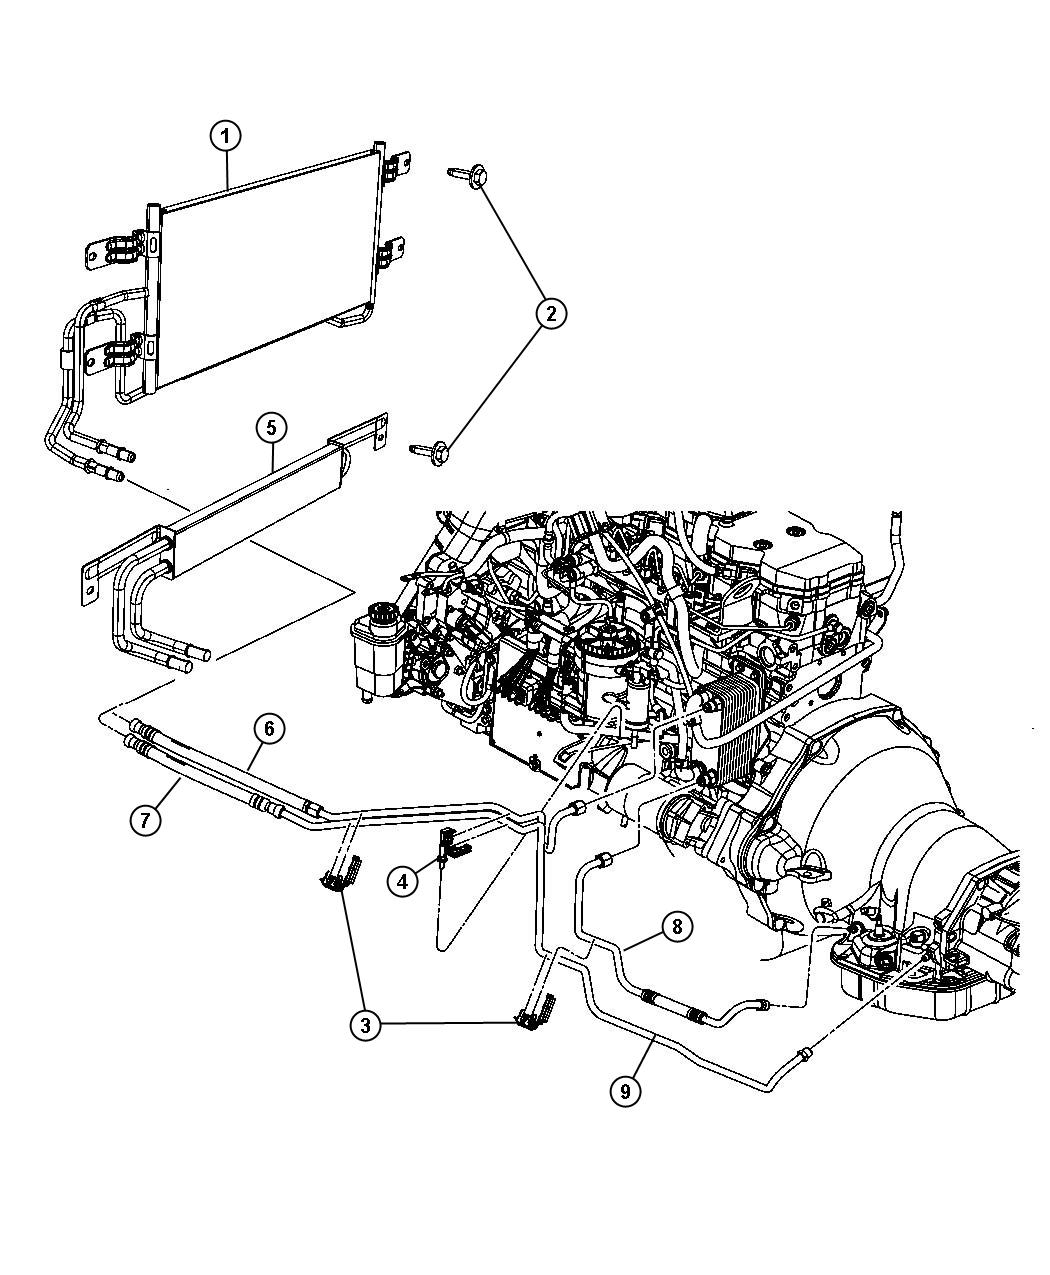 Dodge Ram 2500 Tube. Oil cooler. Pressure. Engine, diesel